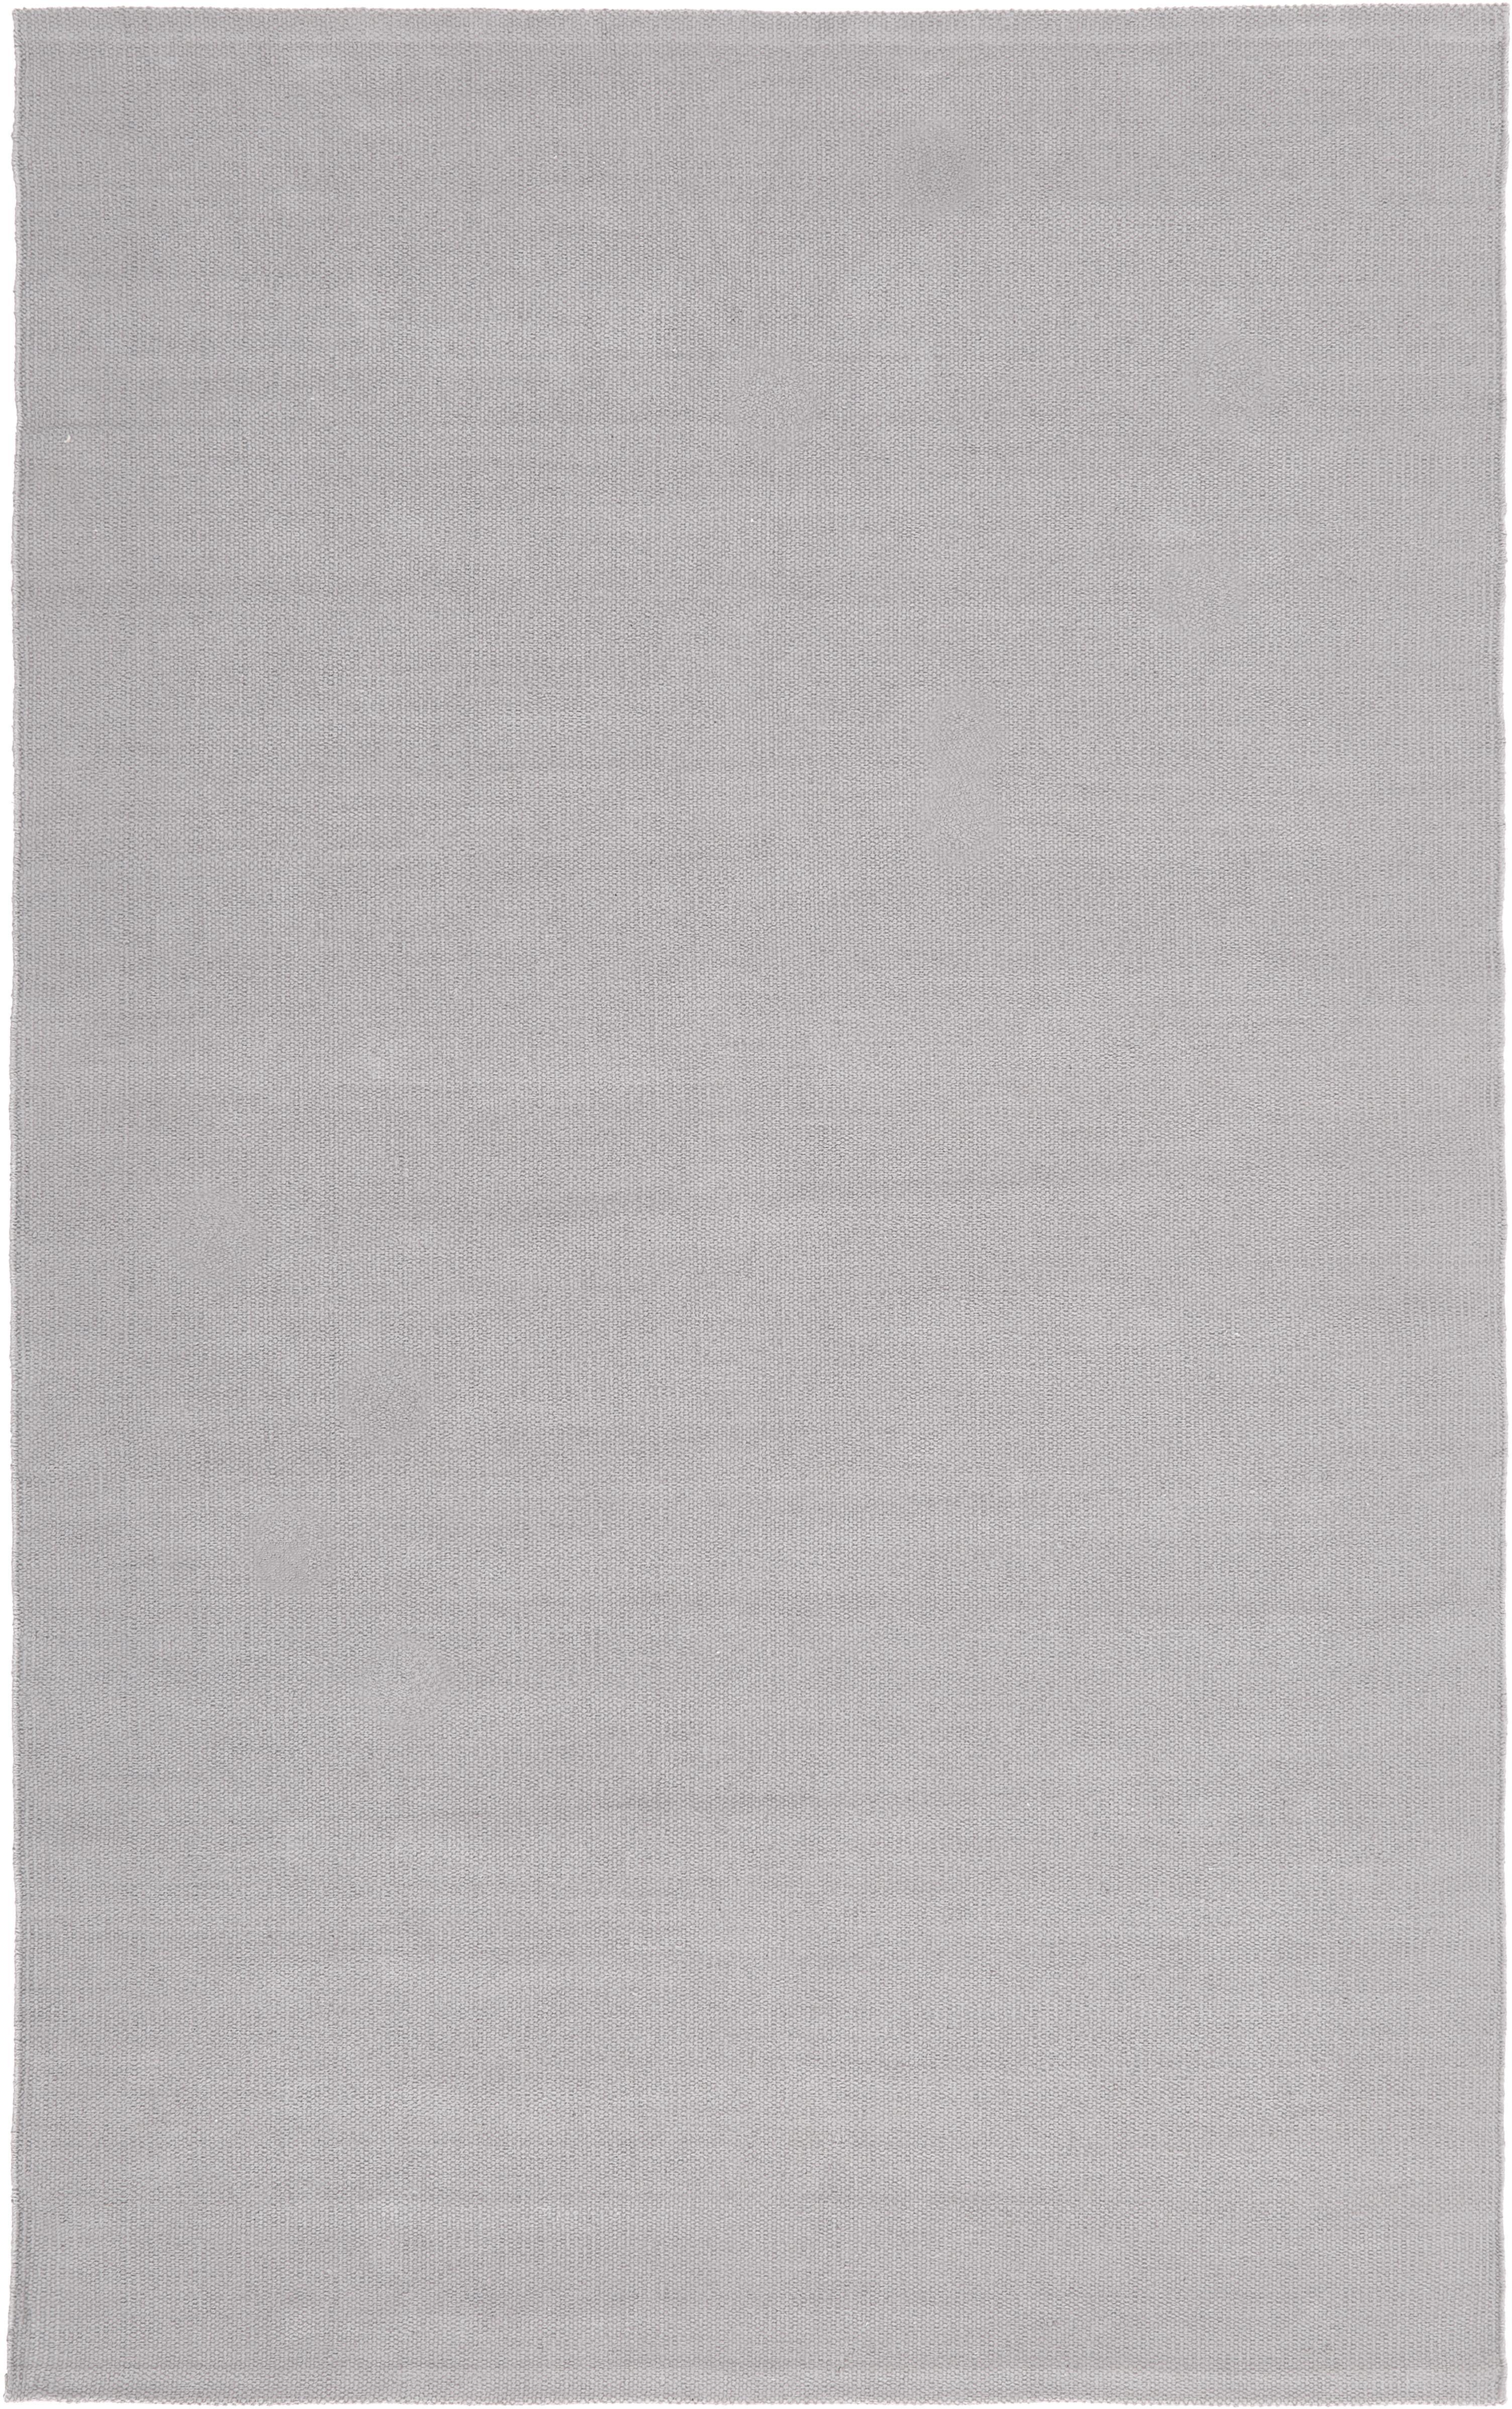 Handgeweven katoenen vloerkleed Agneta, Katoen, Grijs, B 50 x L 80 cm (maat XXS)